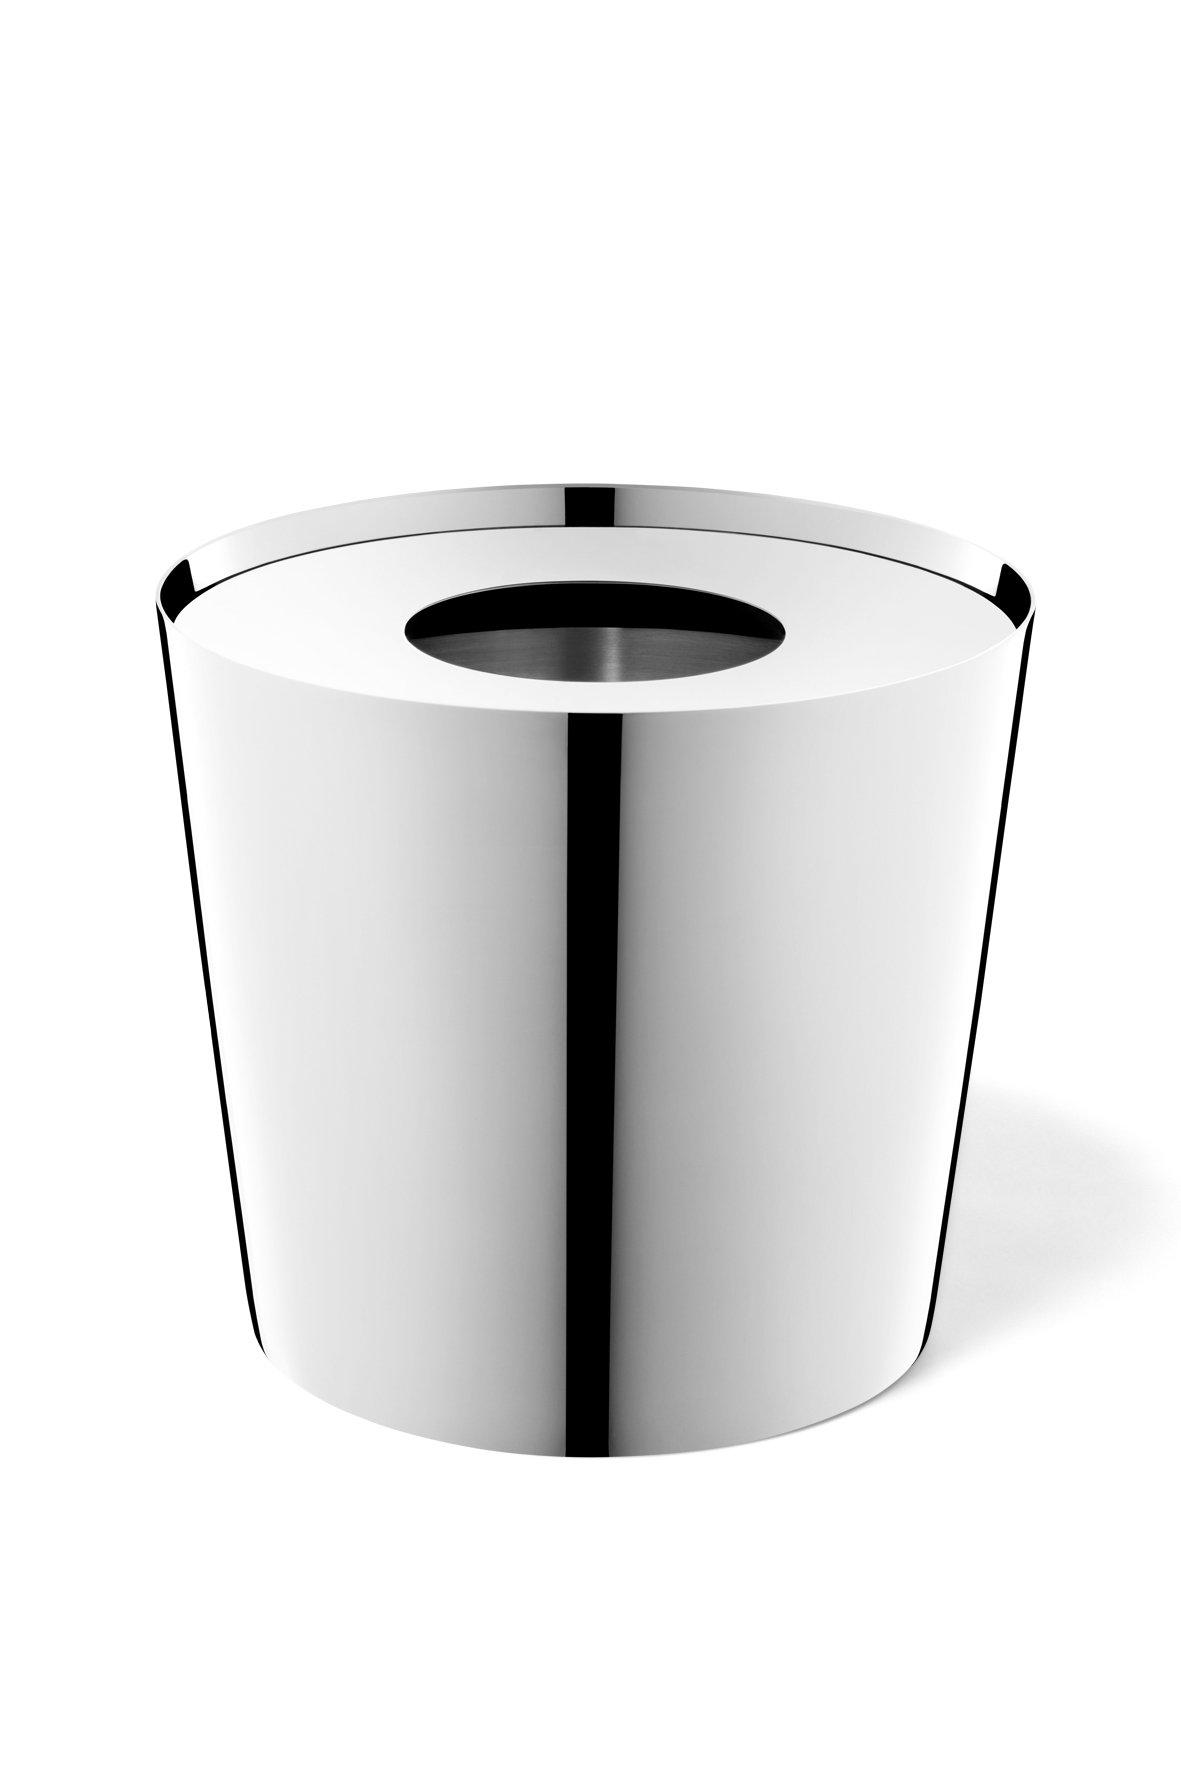 ZACK 40346 Original ''Lyos'' Facial Tissue High Gloss Dispenser, 5.3'' x 5.9'' by Zack